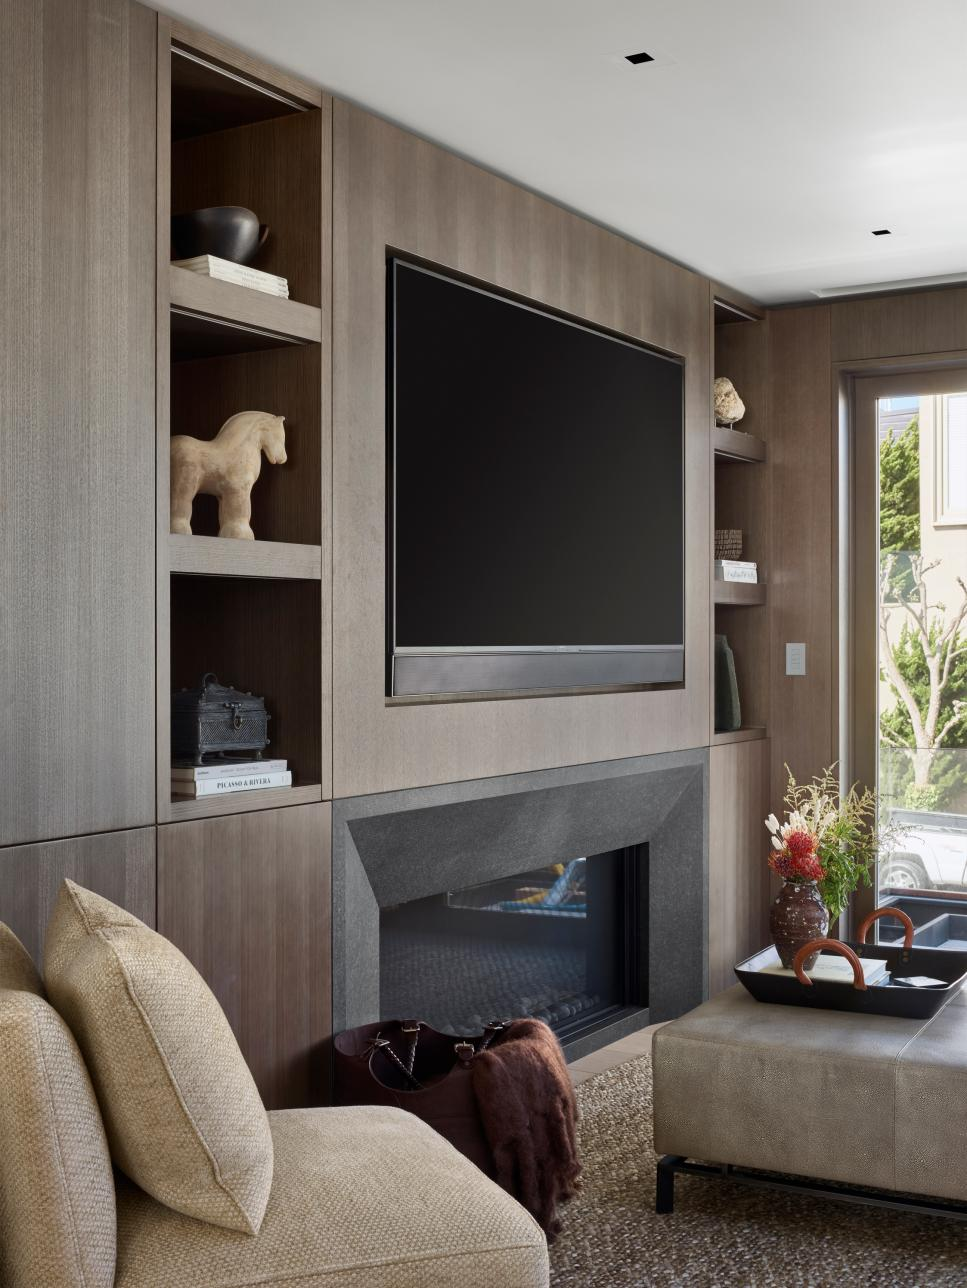 Modern Living Room With Wood Paneling | HGTV